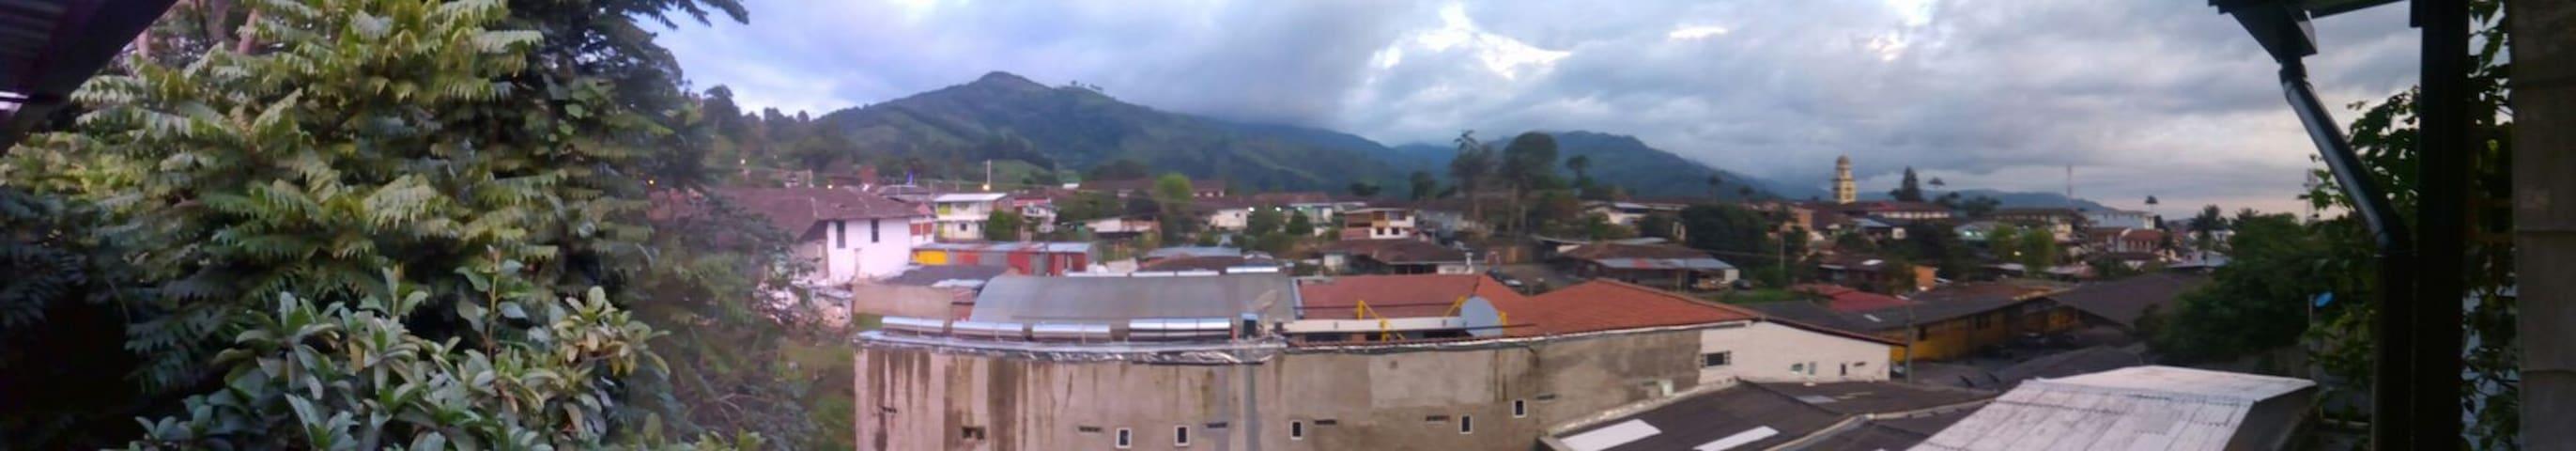 Casa mirador plaza Salento - Salento - Casa